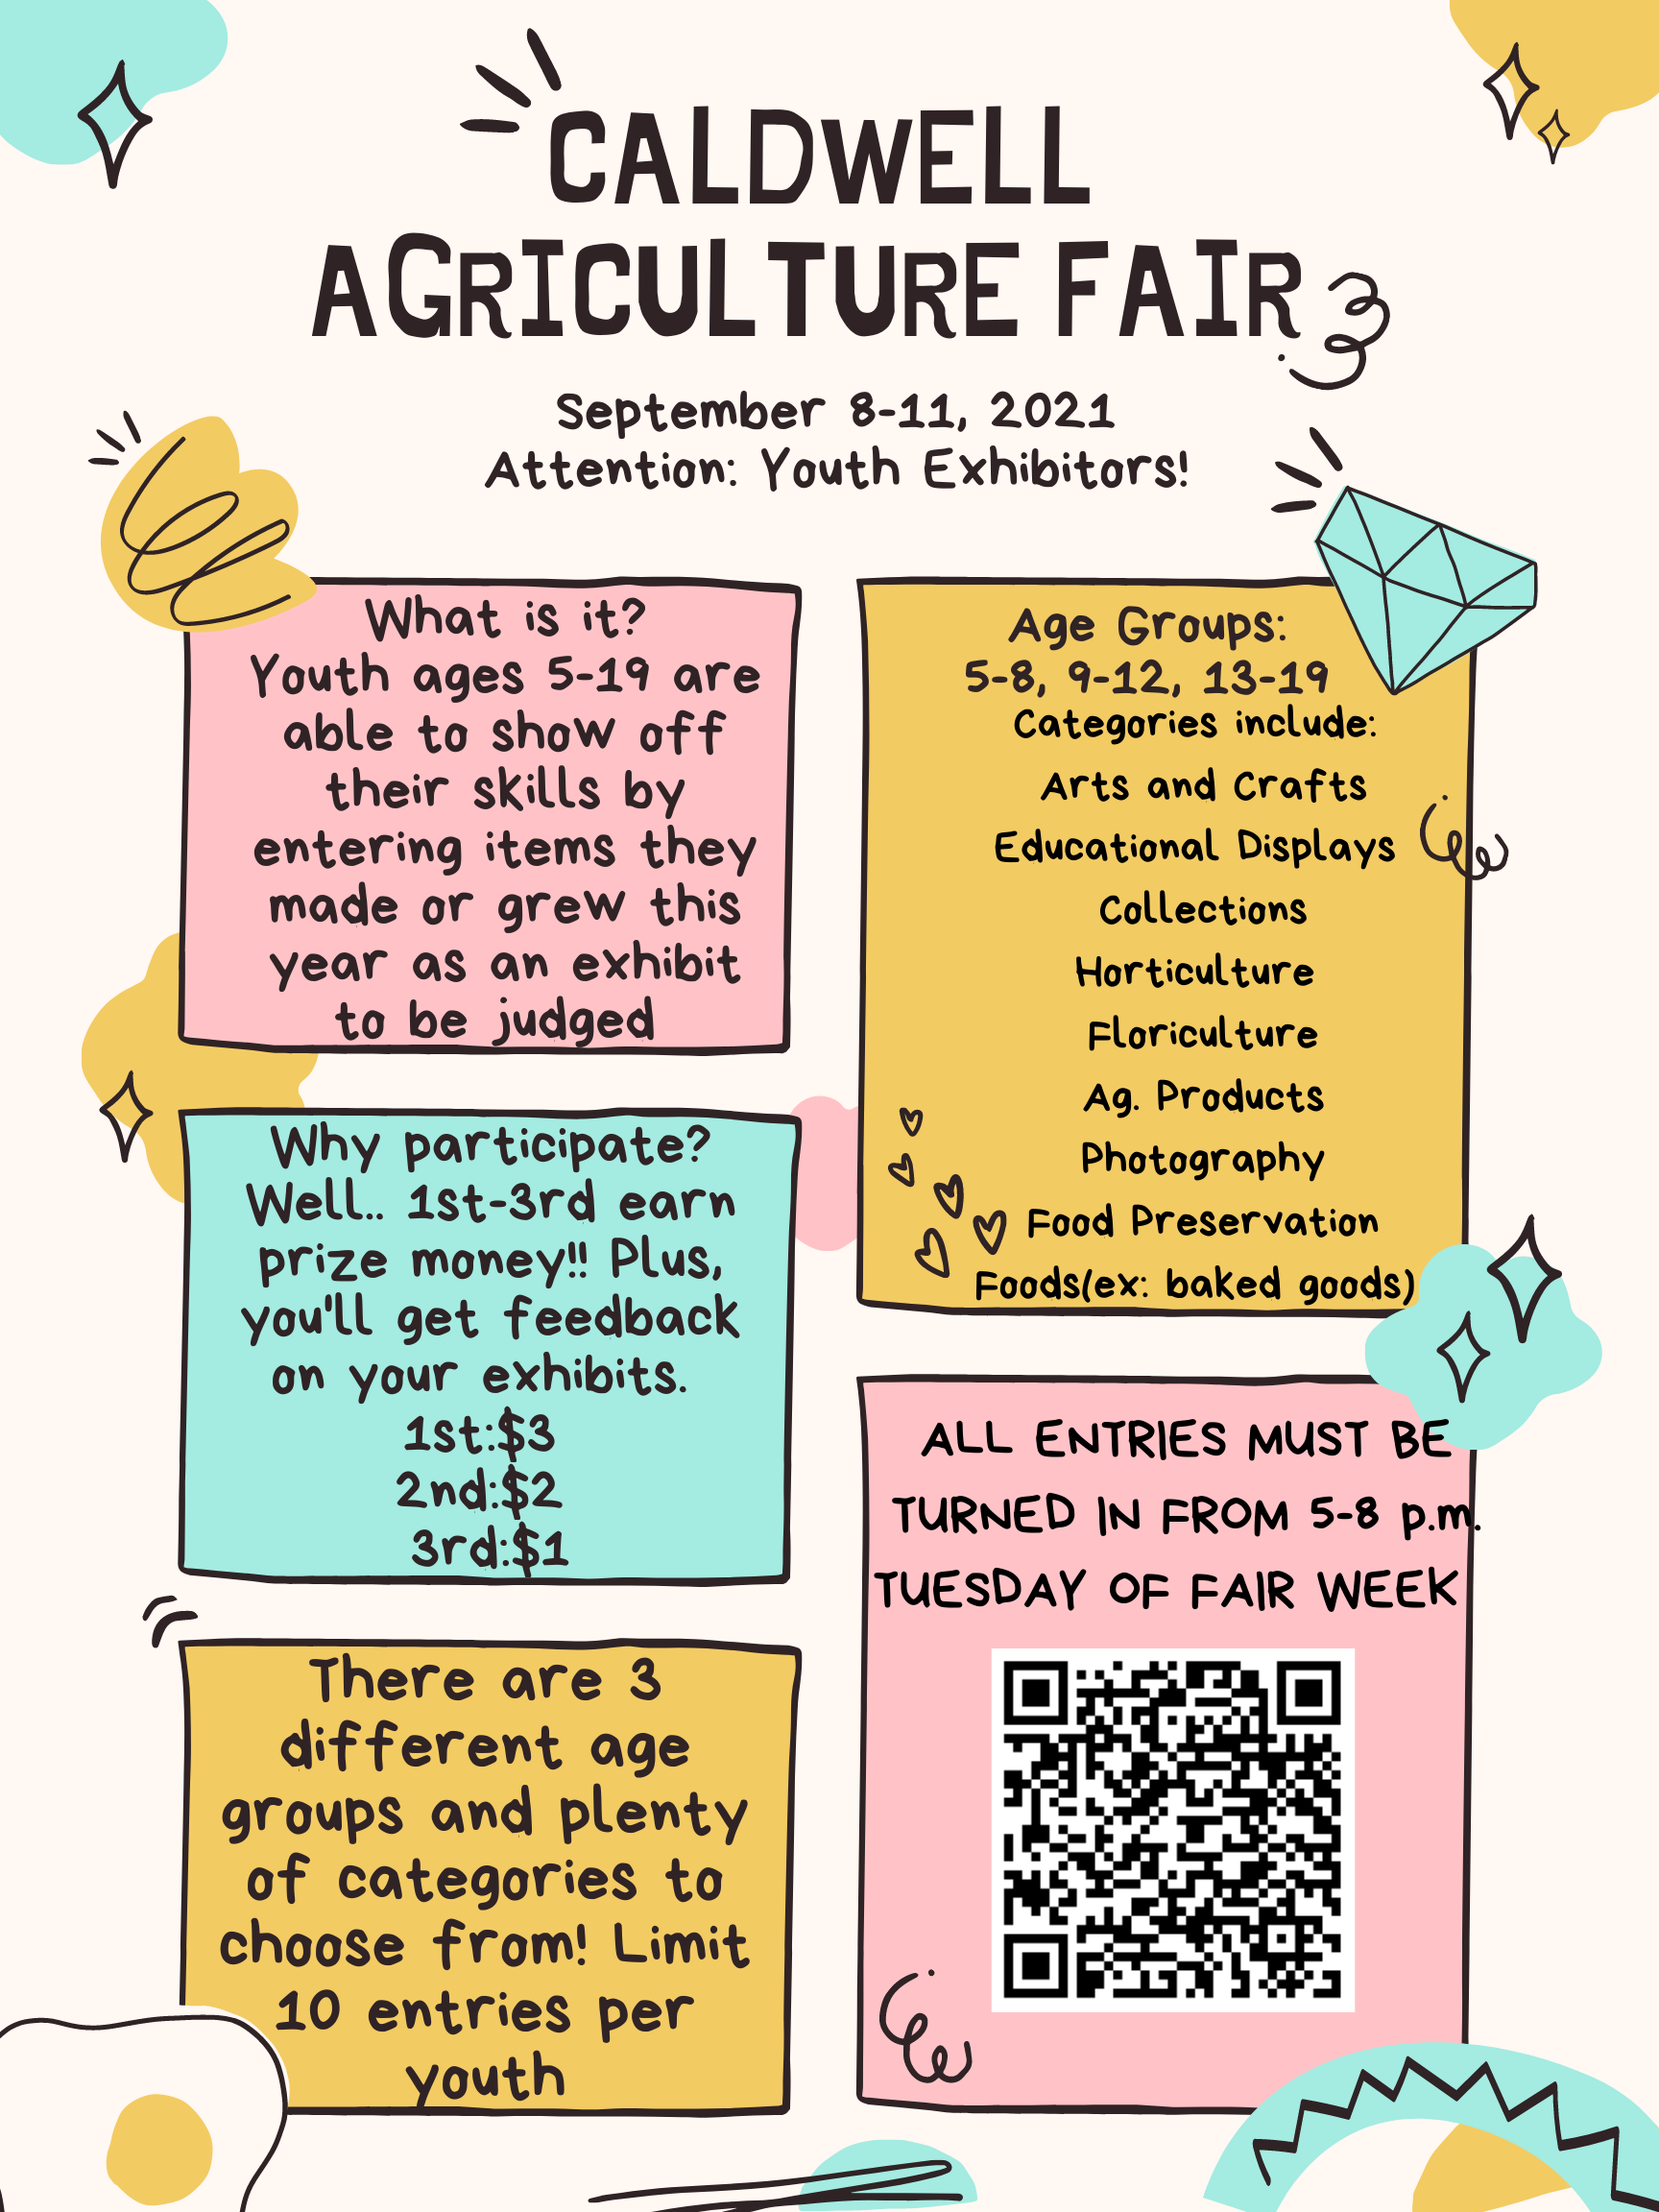 Caldwell Agriculture Fair is September 8-11.